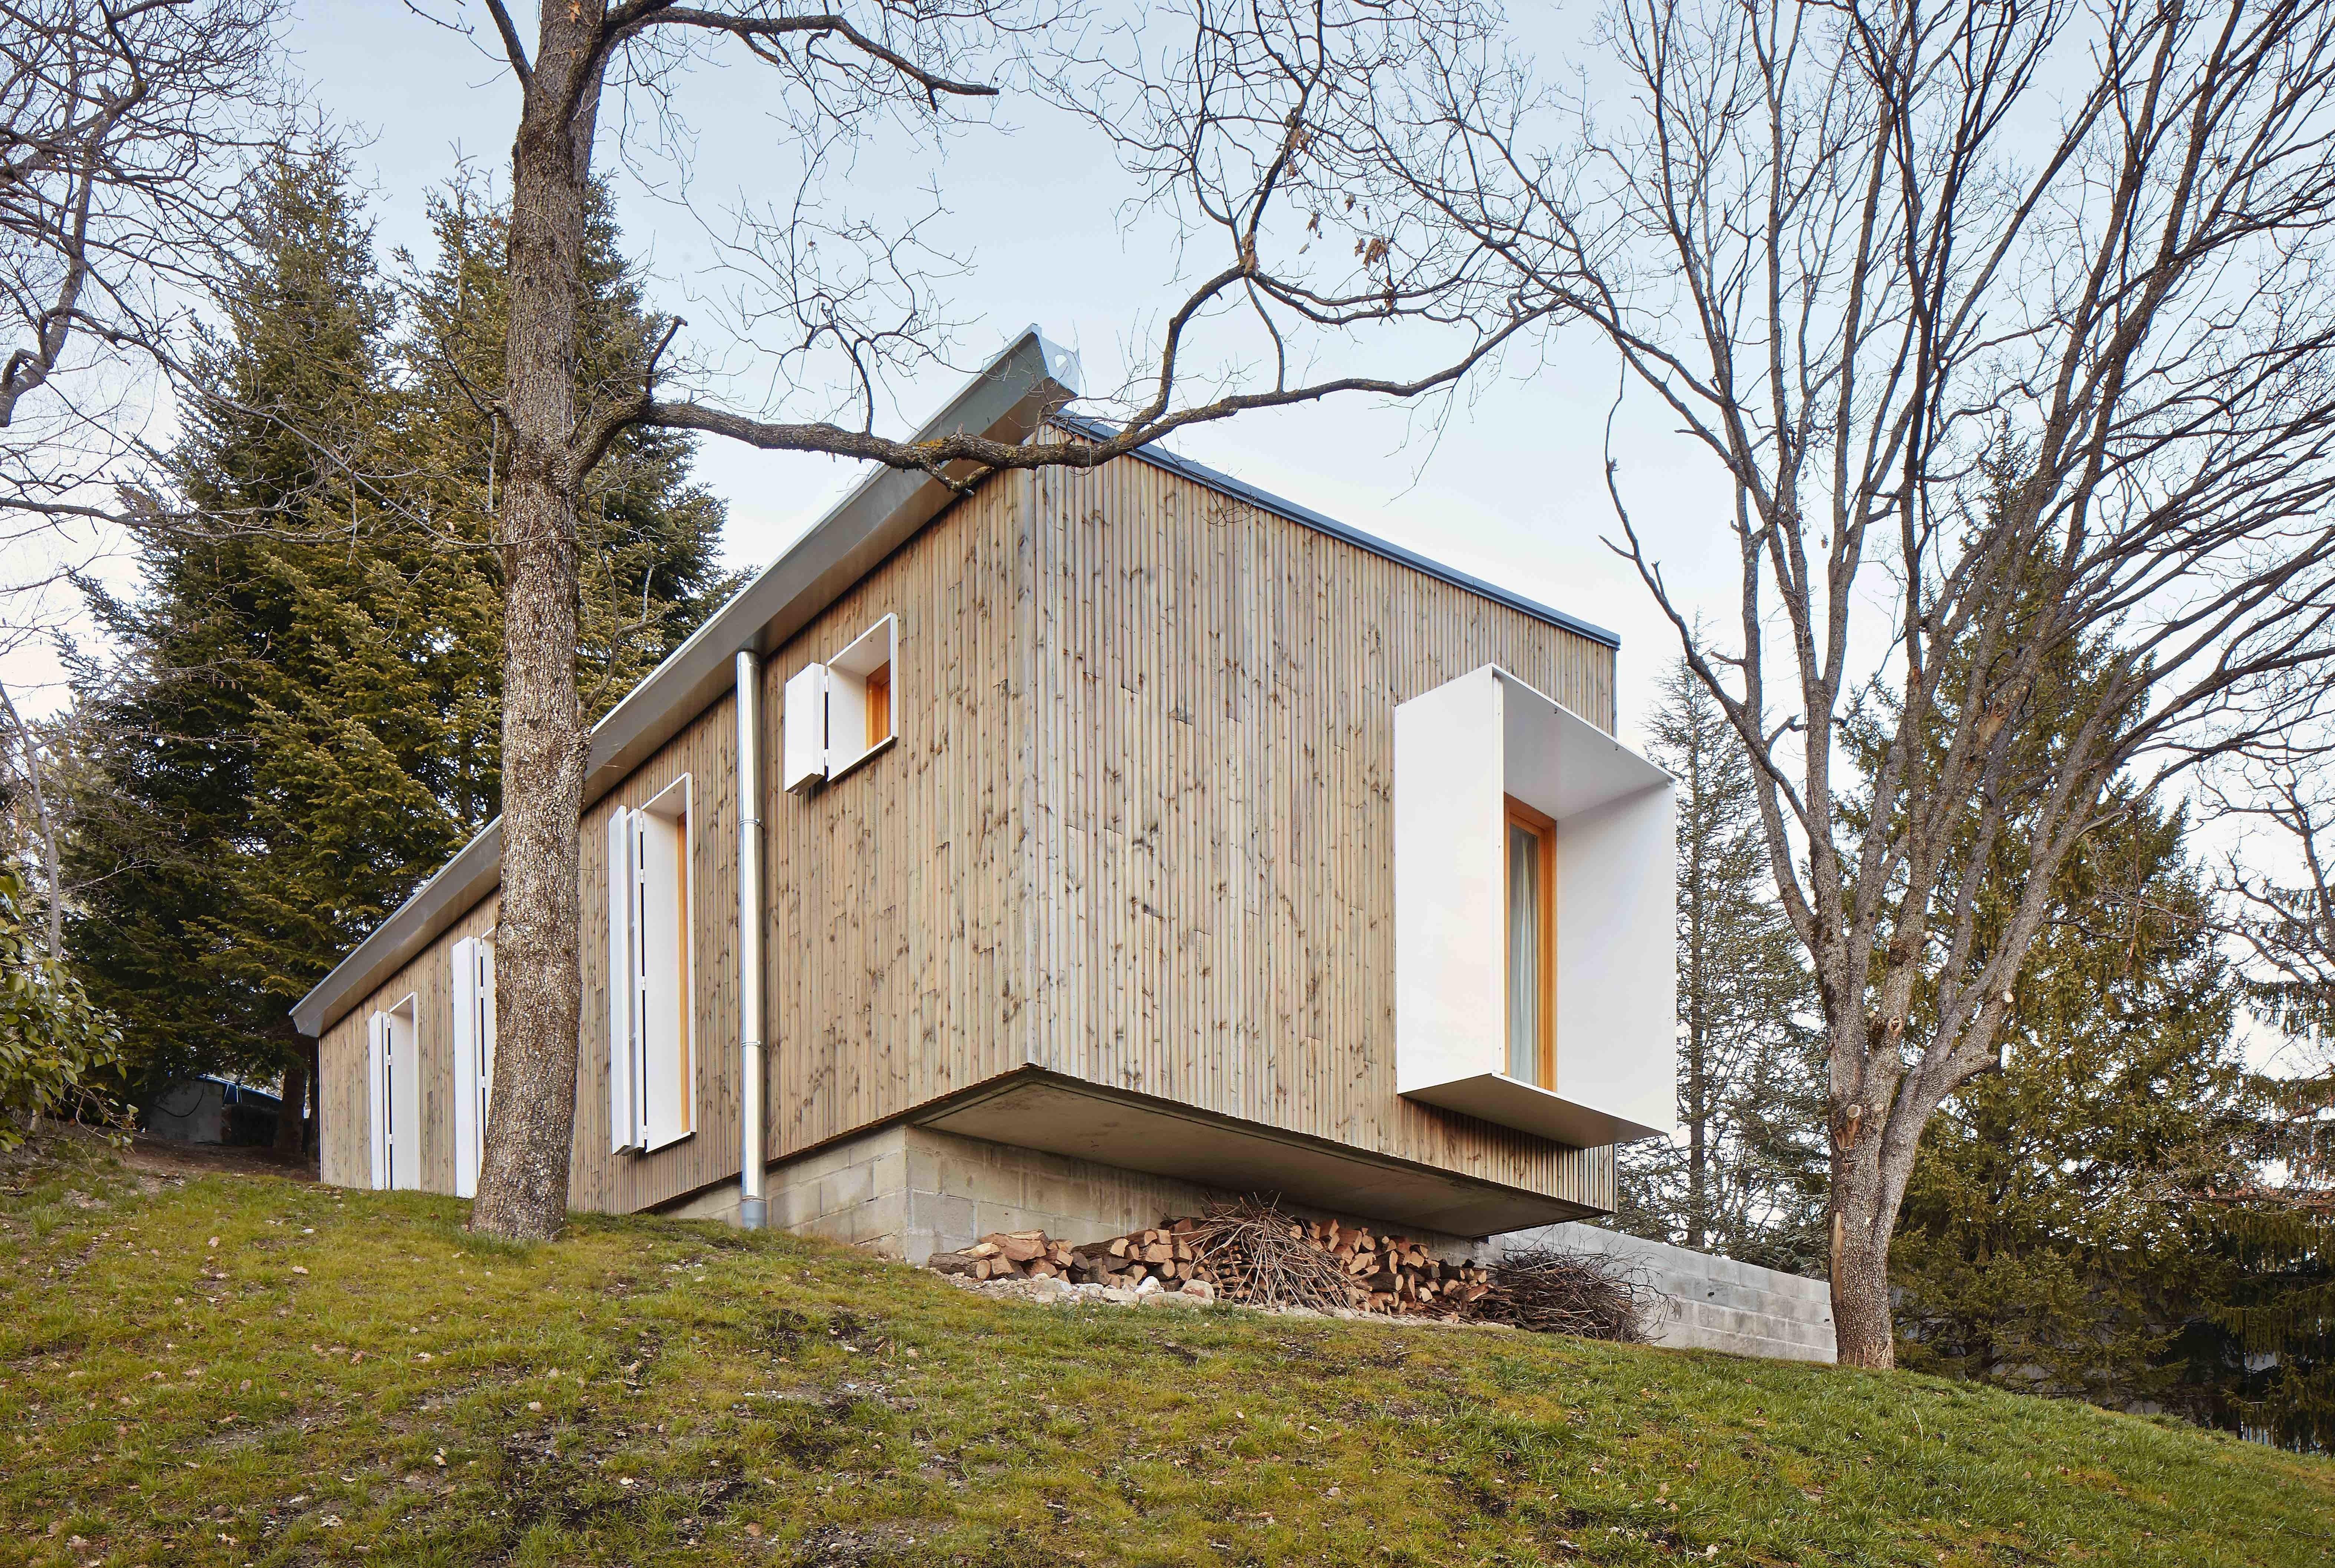 spanish architect marc mogas transported the prefabricated interior rh pinterest com